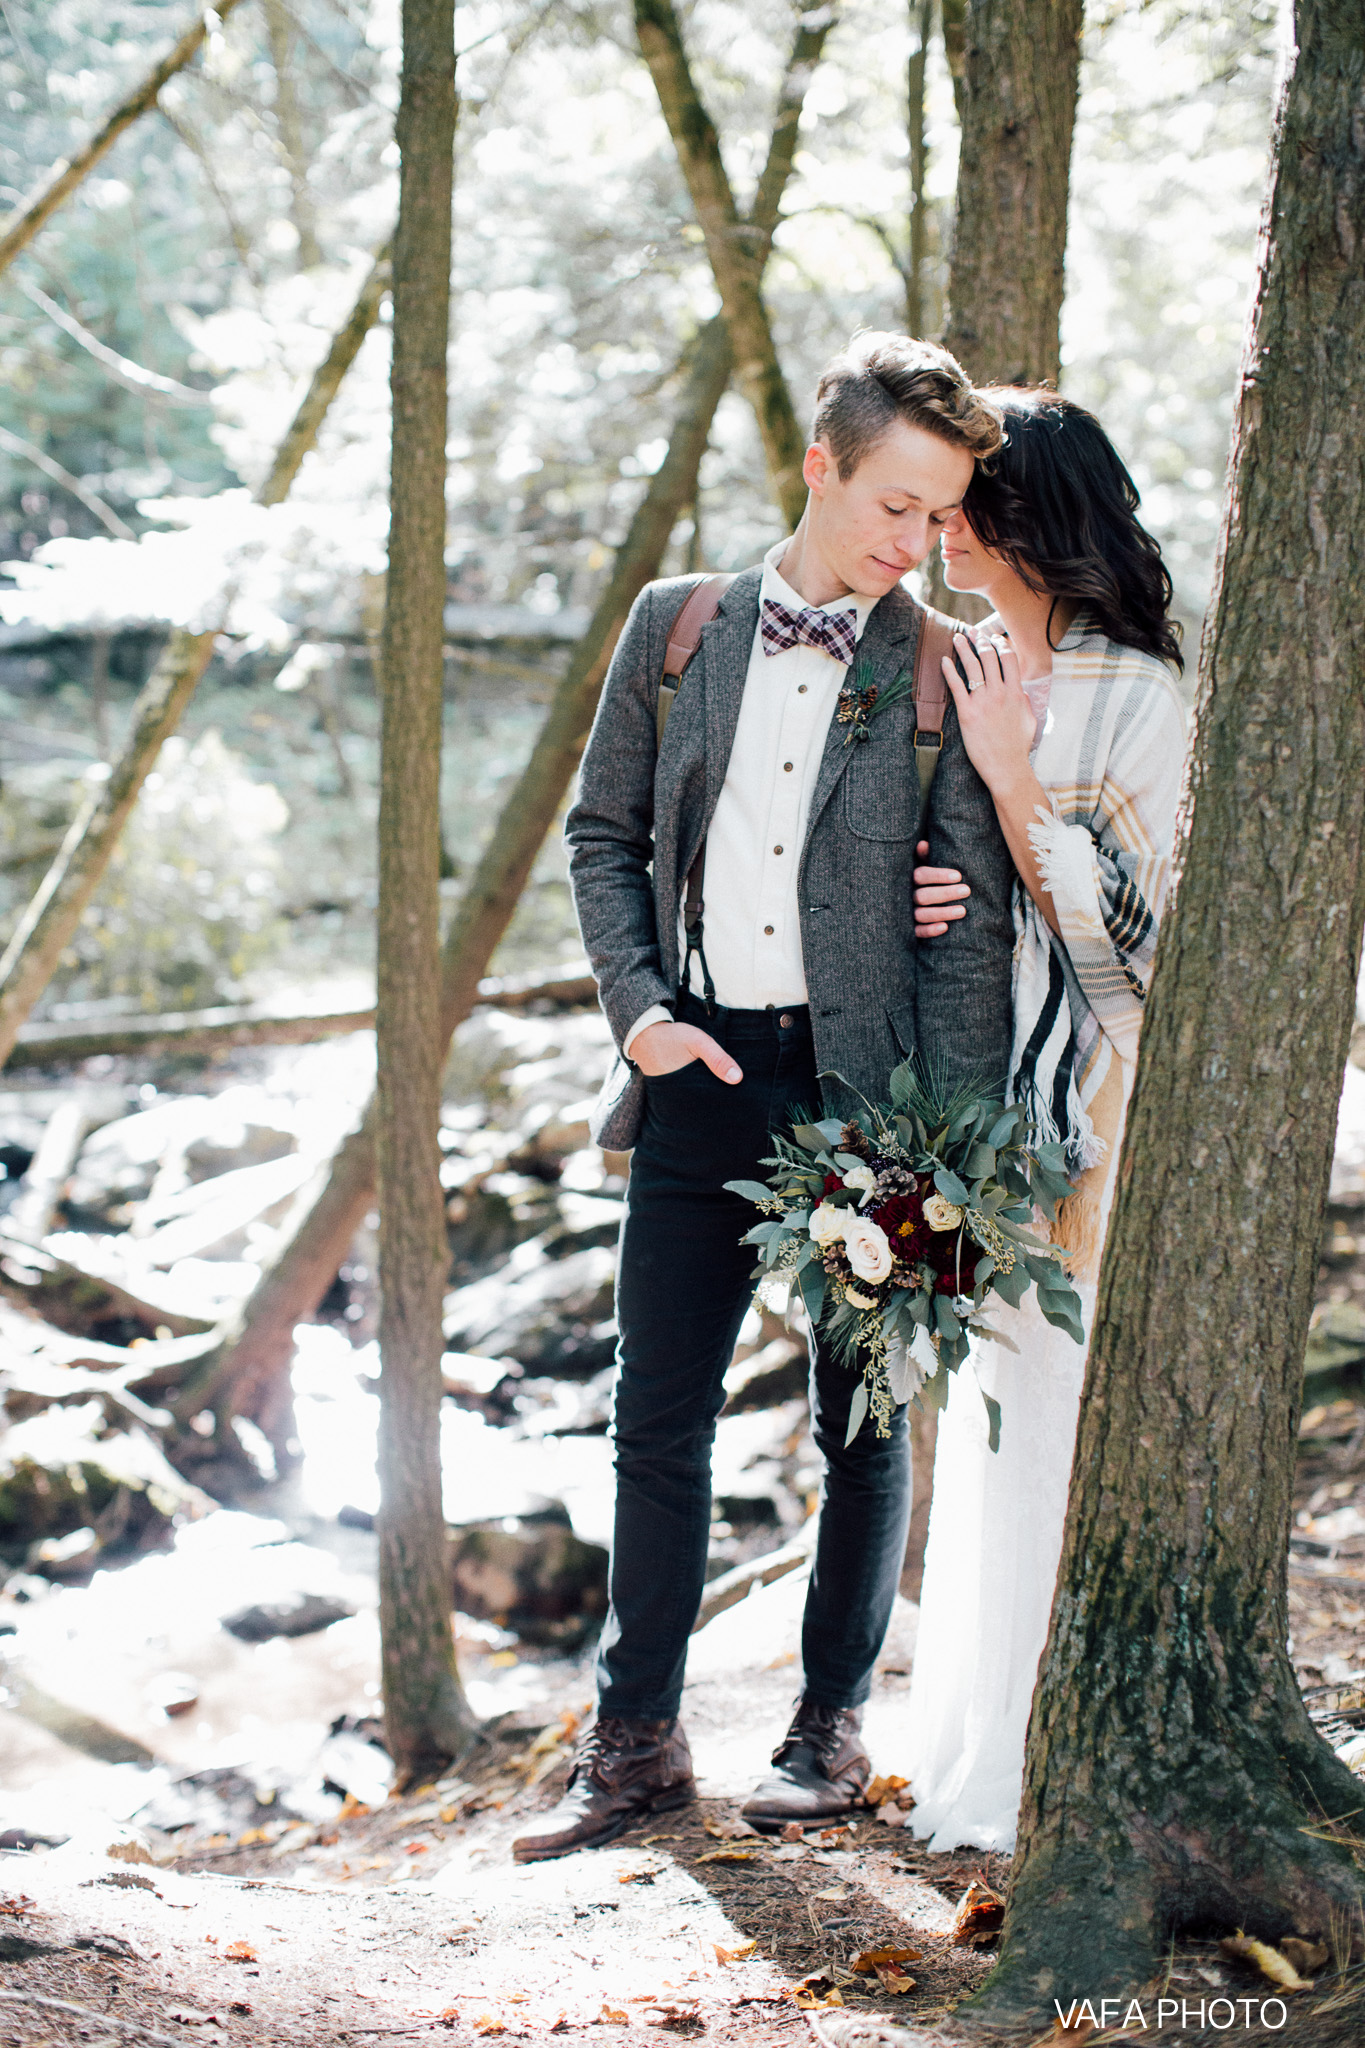 Hogback-Mountain-Wedding-Chelsea-Josh-Vafa-Photo-498.jpg